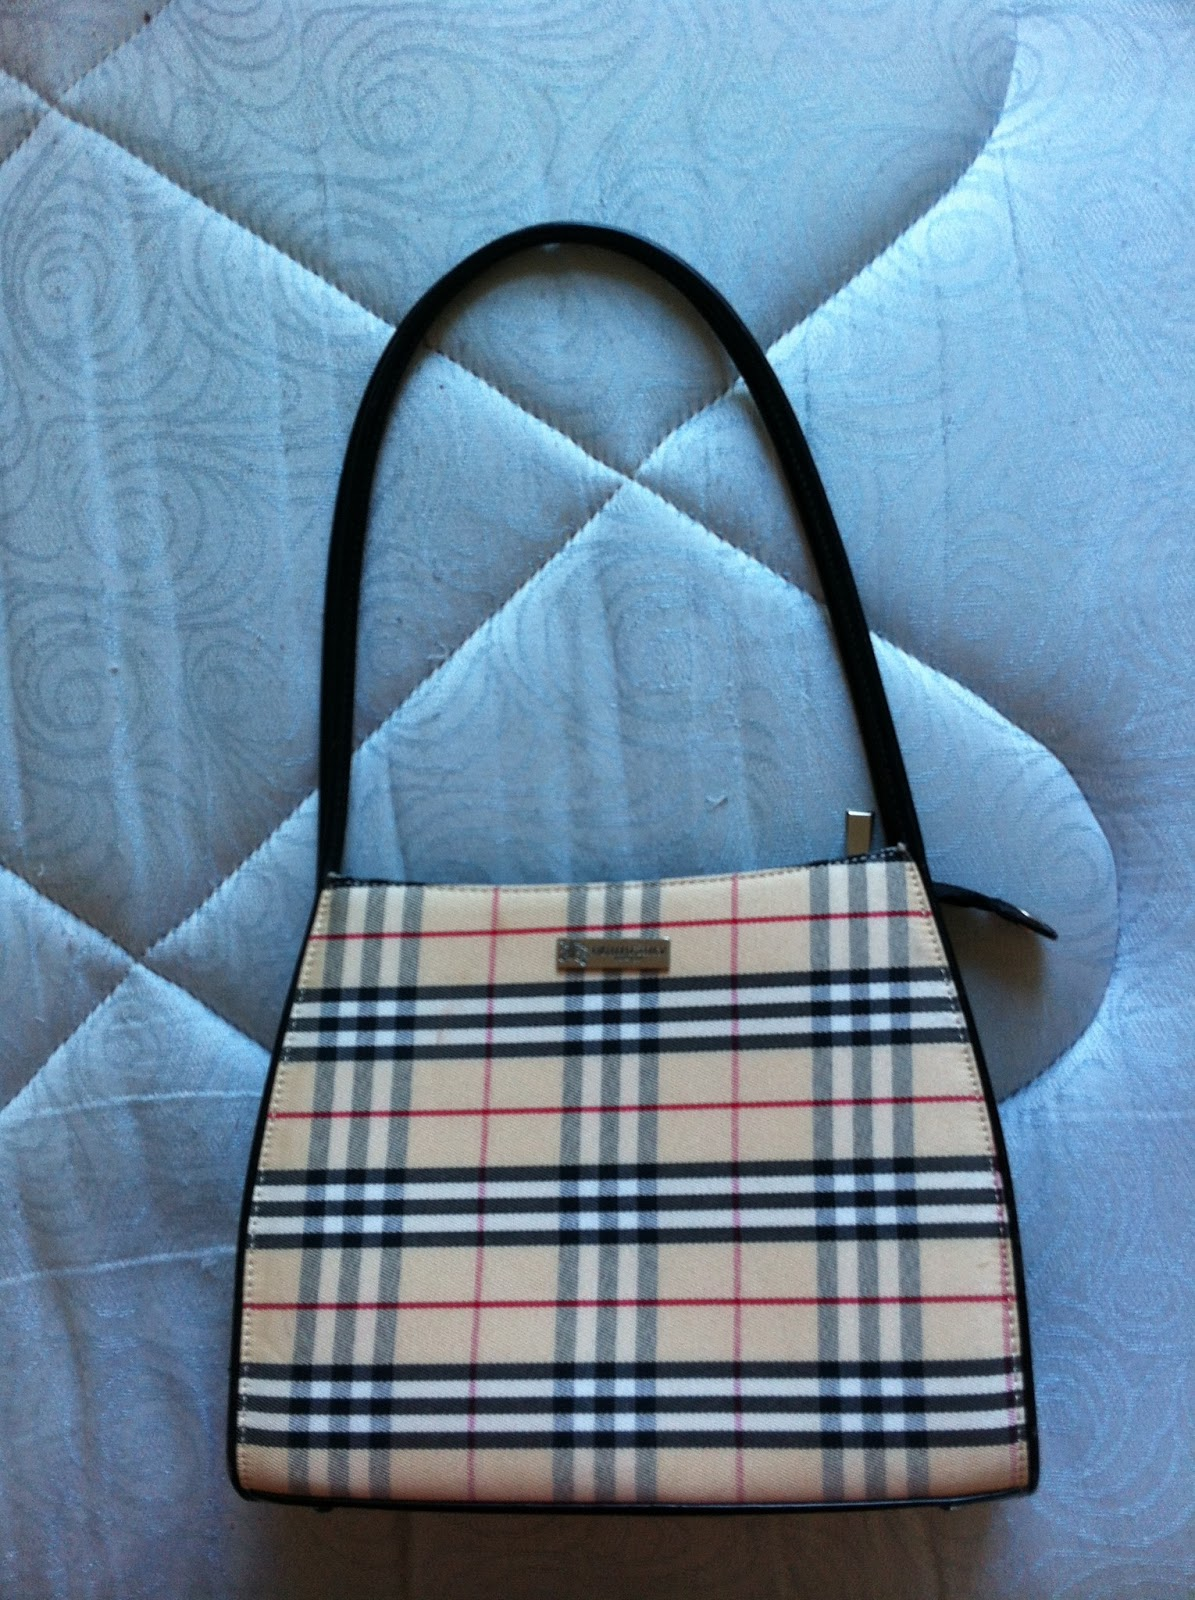 AZIM WIGAN (UK) PRE LOVED: BURBERRY LONDON HANDBAG - bag burberry london